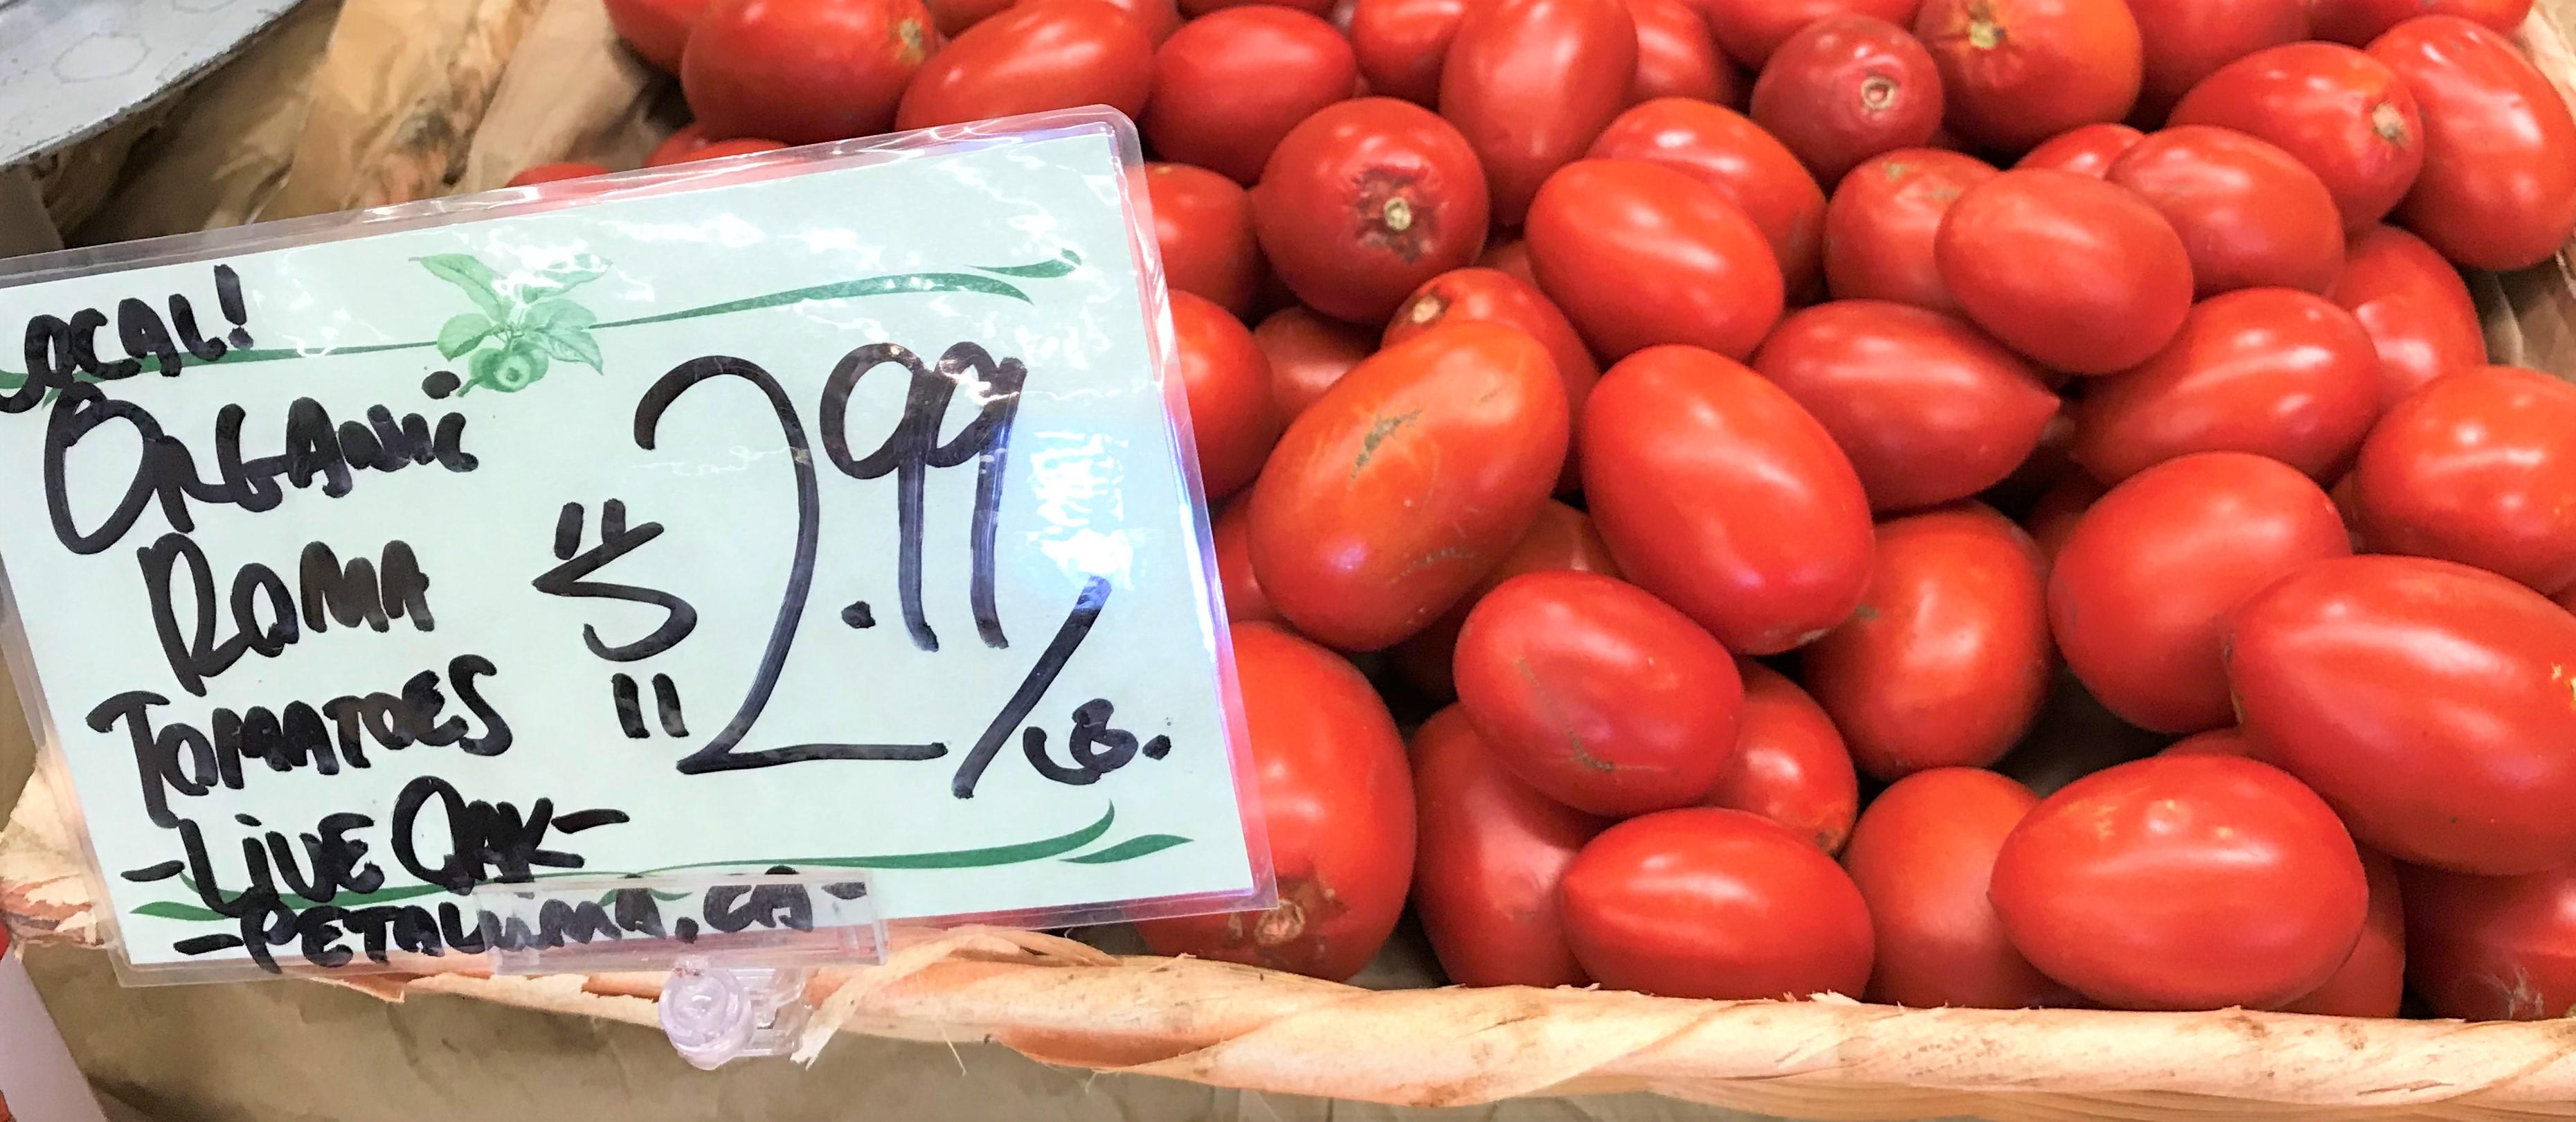 Involtini tomatoes